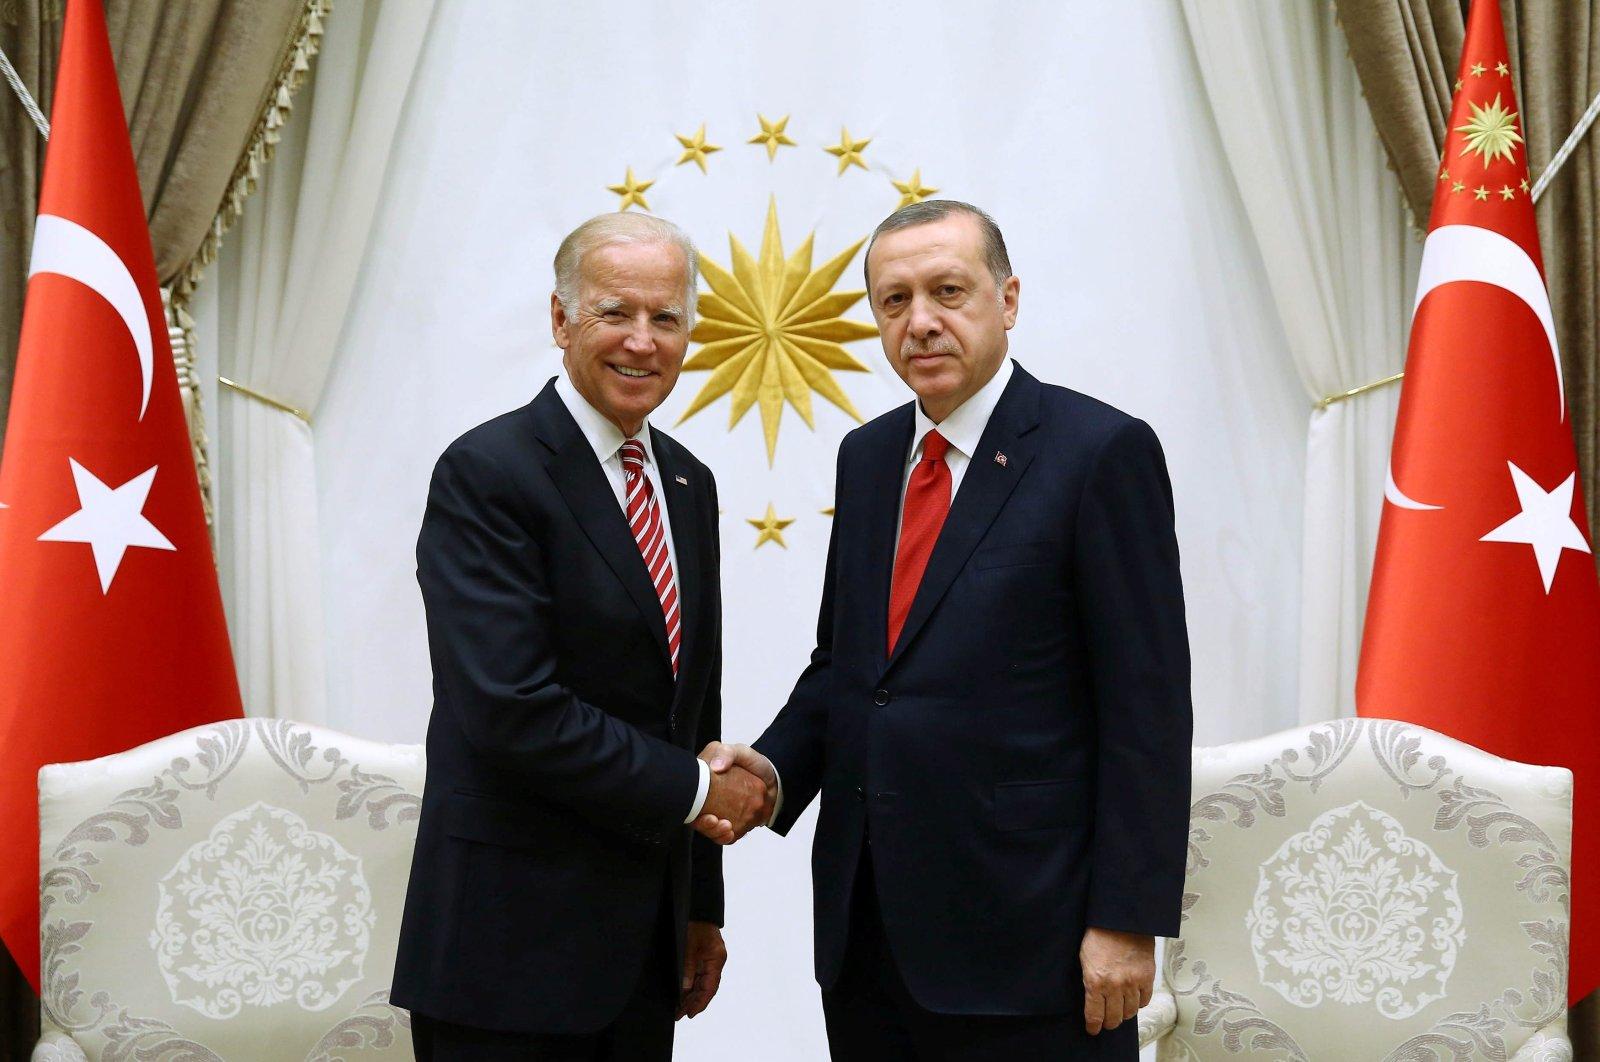 Turkish President Recep Tayyip Erdoğan meets with then-U.S. Vice President Biden at the Presidential Palace in Ankara, Turkey, Aug. 24, 2016. (Reuters Photo)